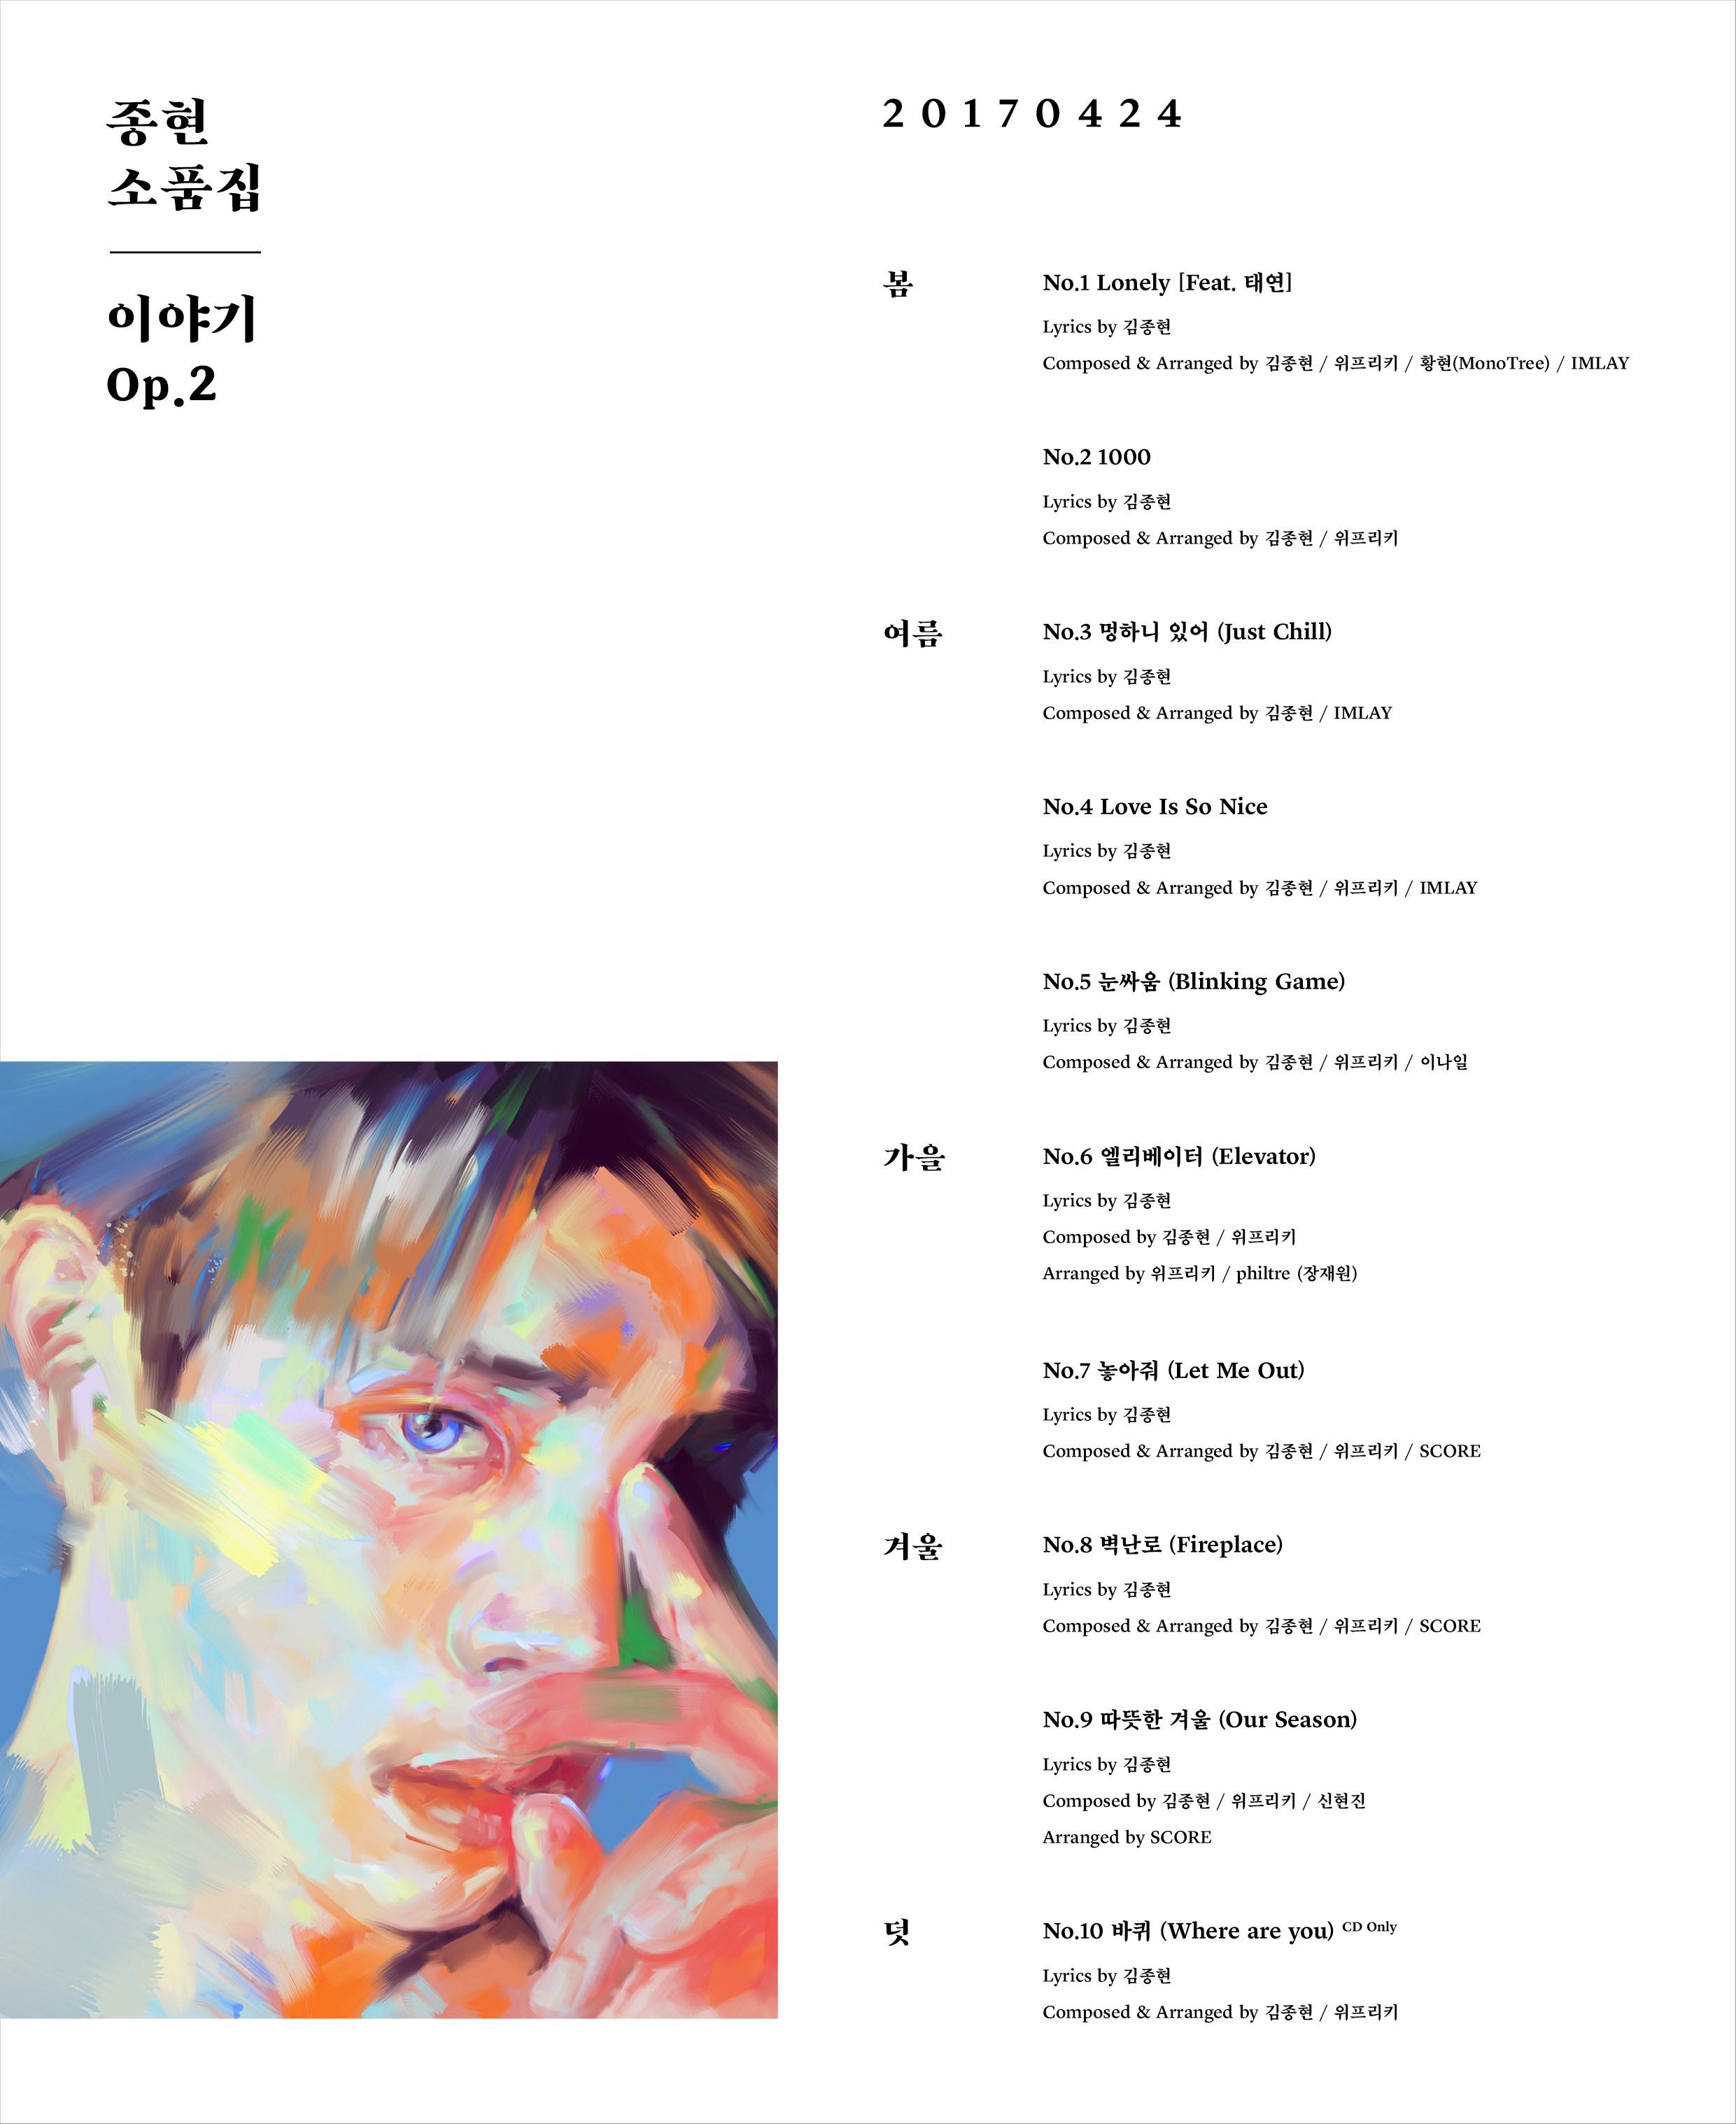 [Tracklist] JONGHYUN – Story Op.2